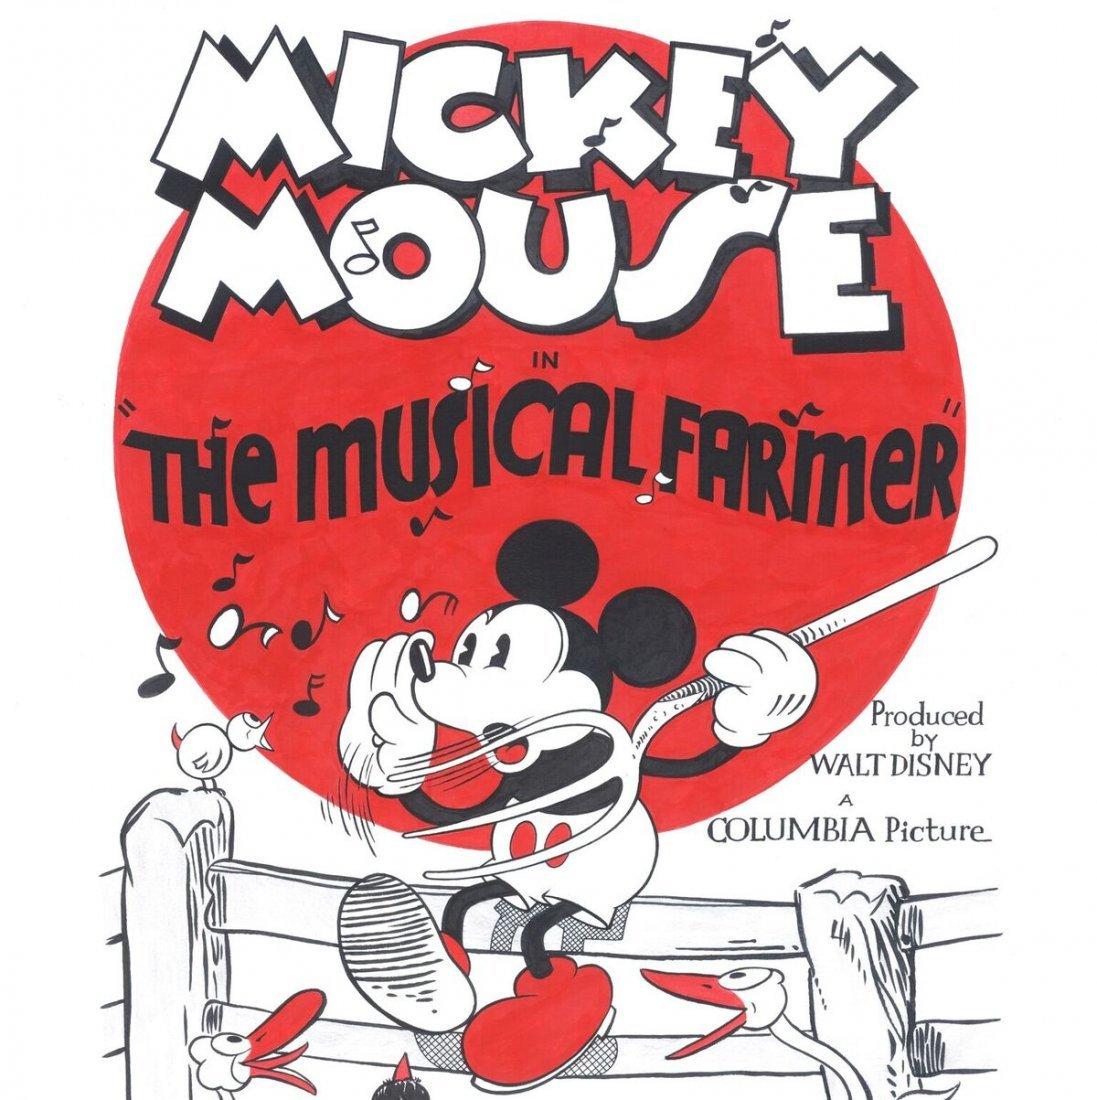 Disney Original Poster - Musical Farmer - Mickey Mouse